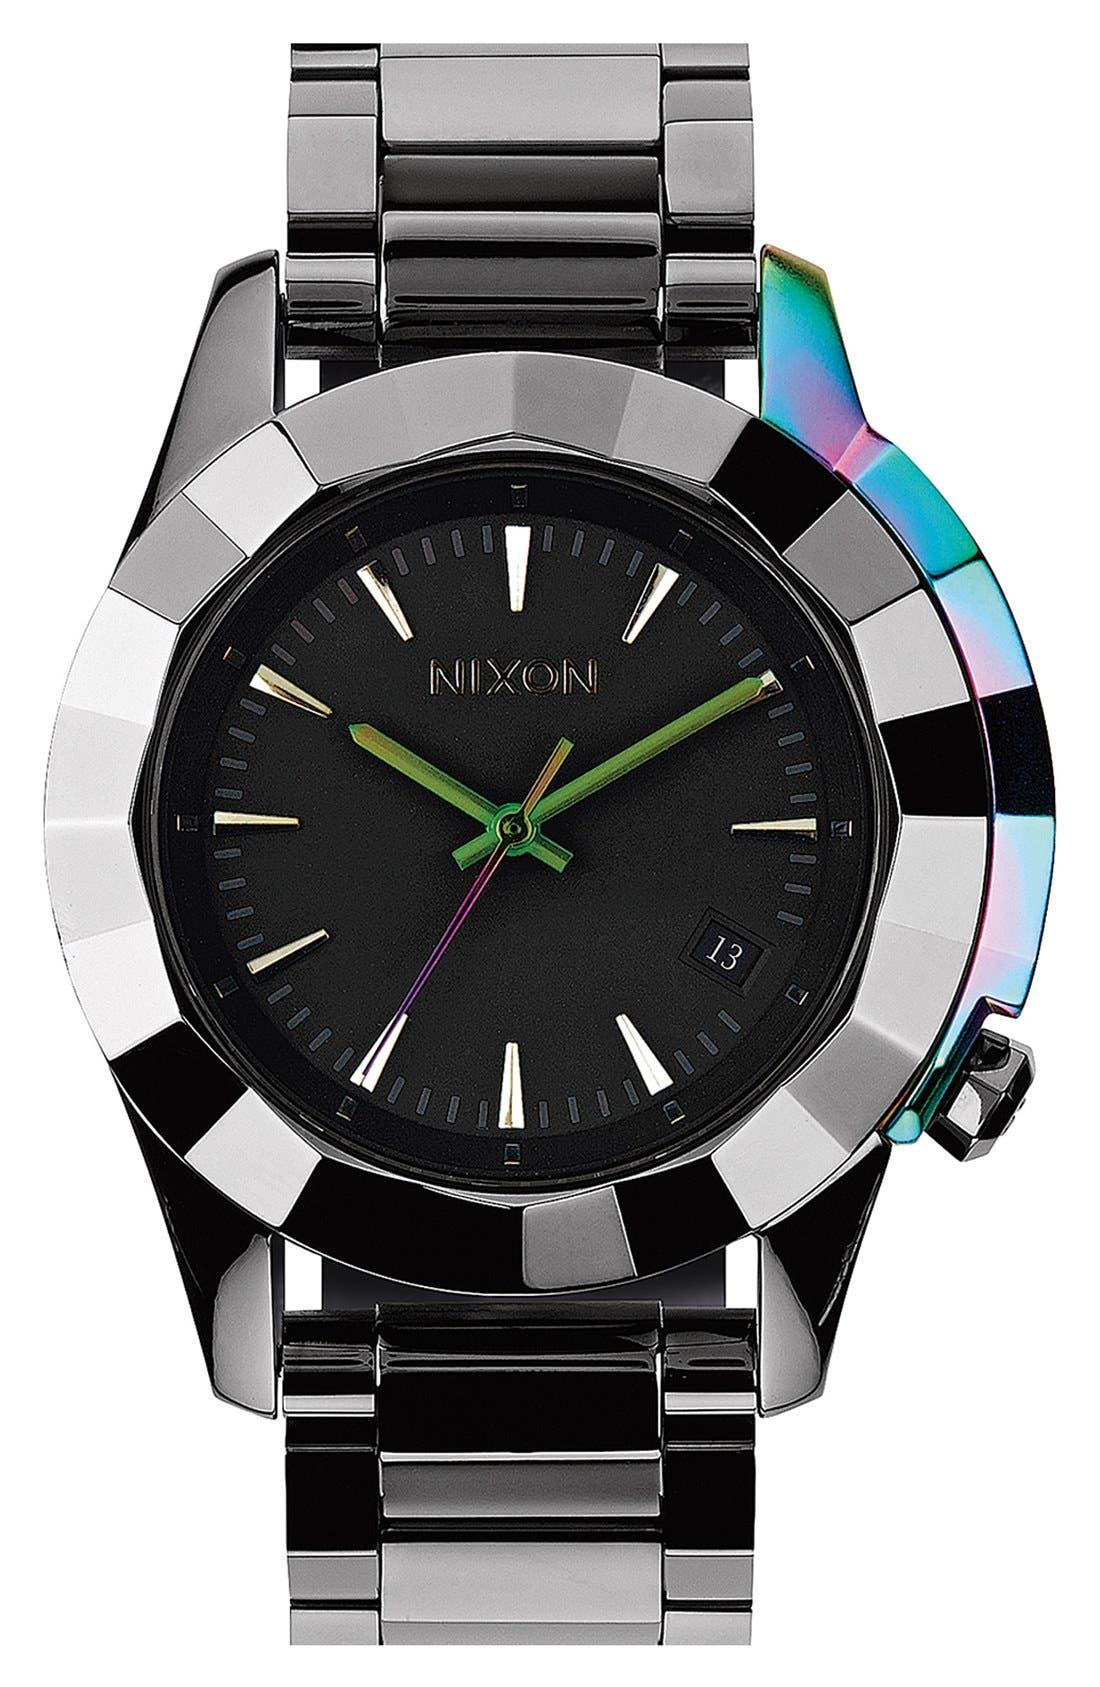 Main Image - Nixon 'The Monarch' Iridescent Accent Faceted Bezel Bracelet Watch, 38mm